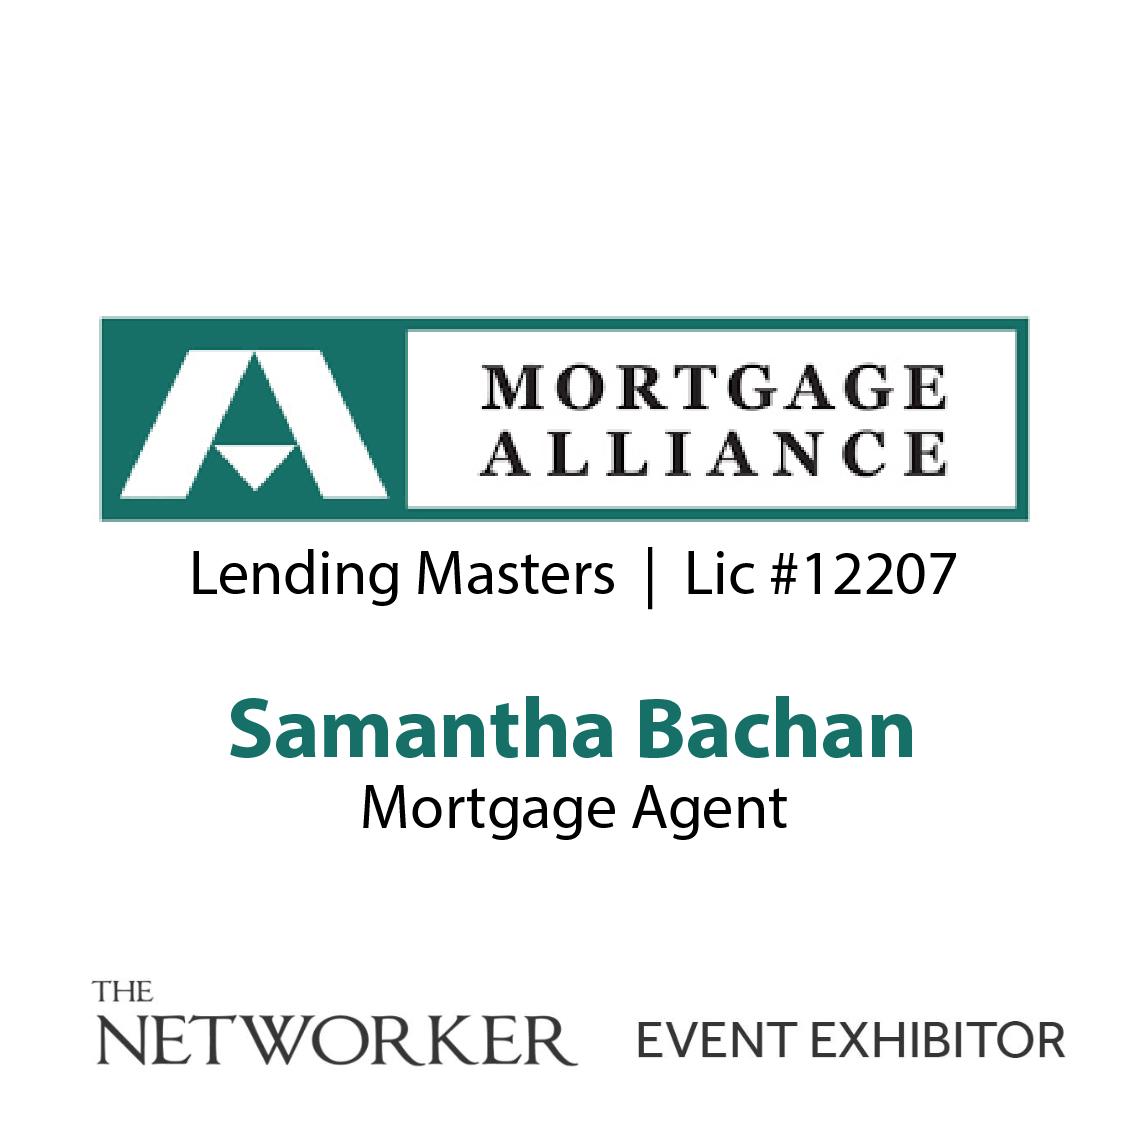 Mortgage Alliance - Samantha Bachan